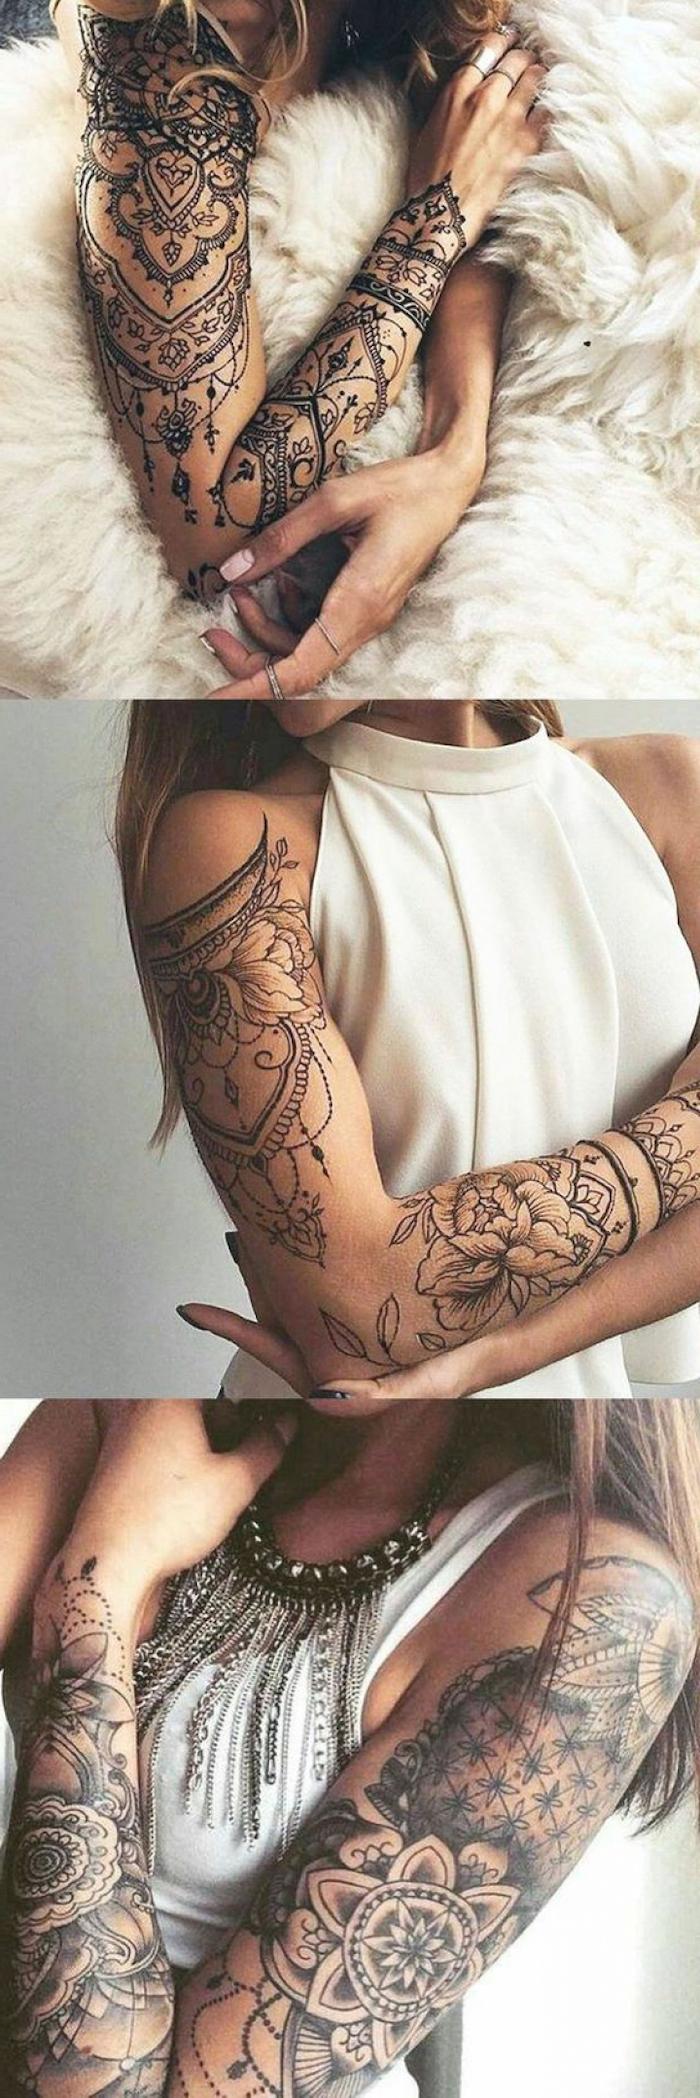 three different tattoos, white top, mandala tattoos, half sleeve tattoo ideas, side by side photos